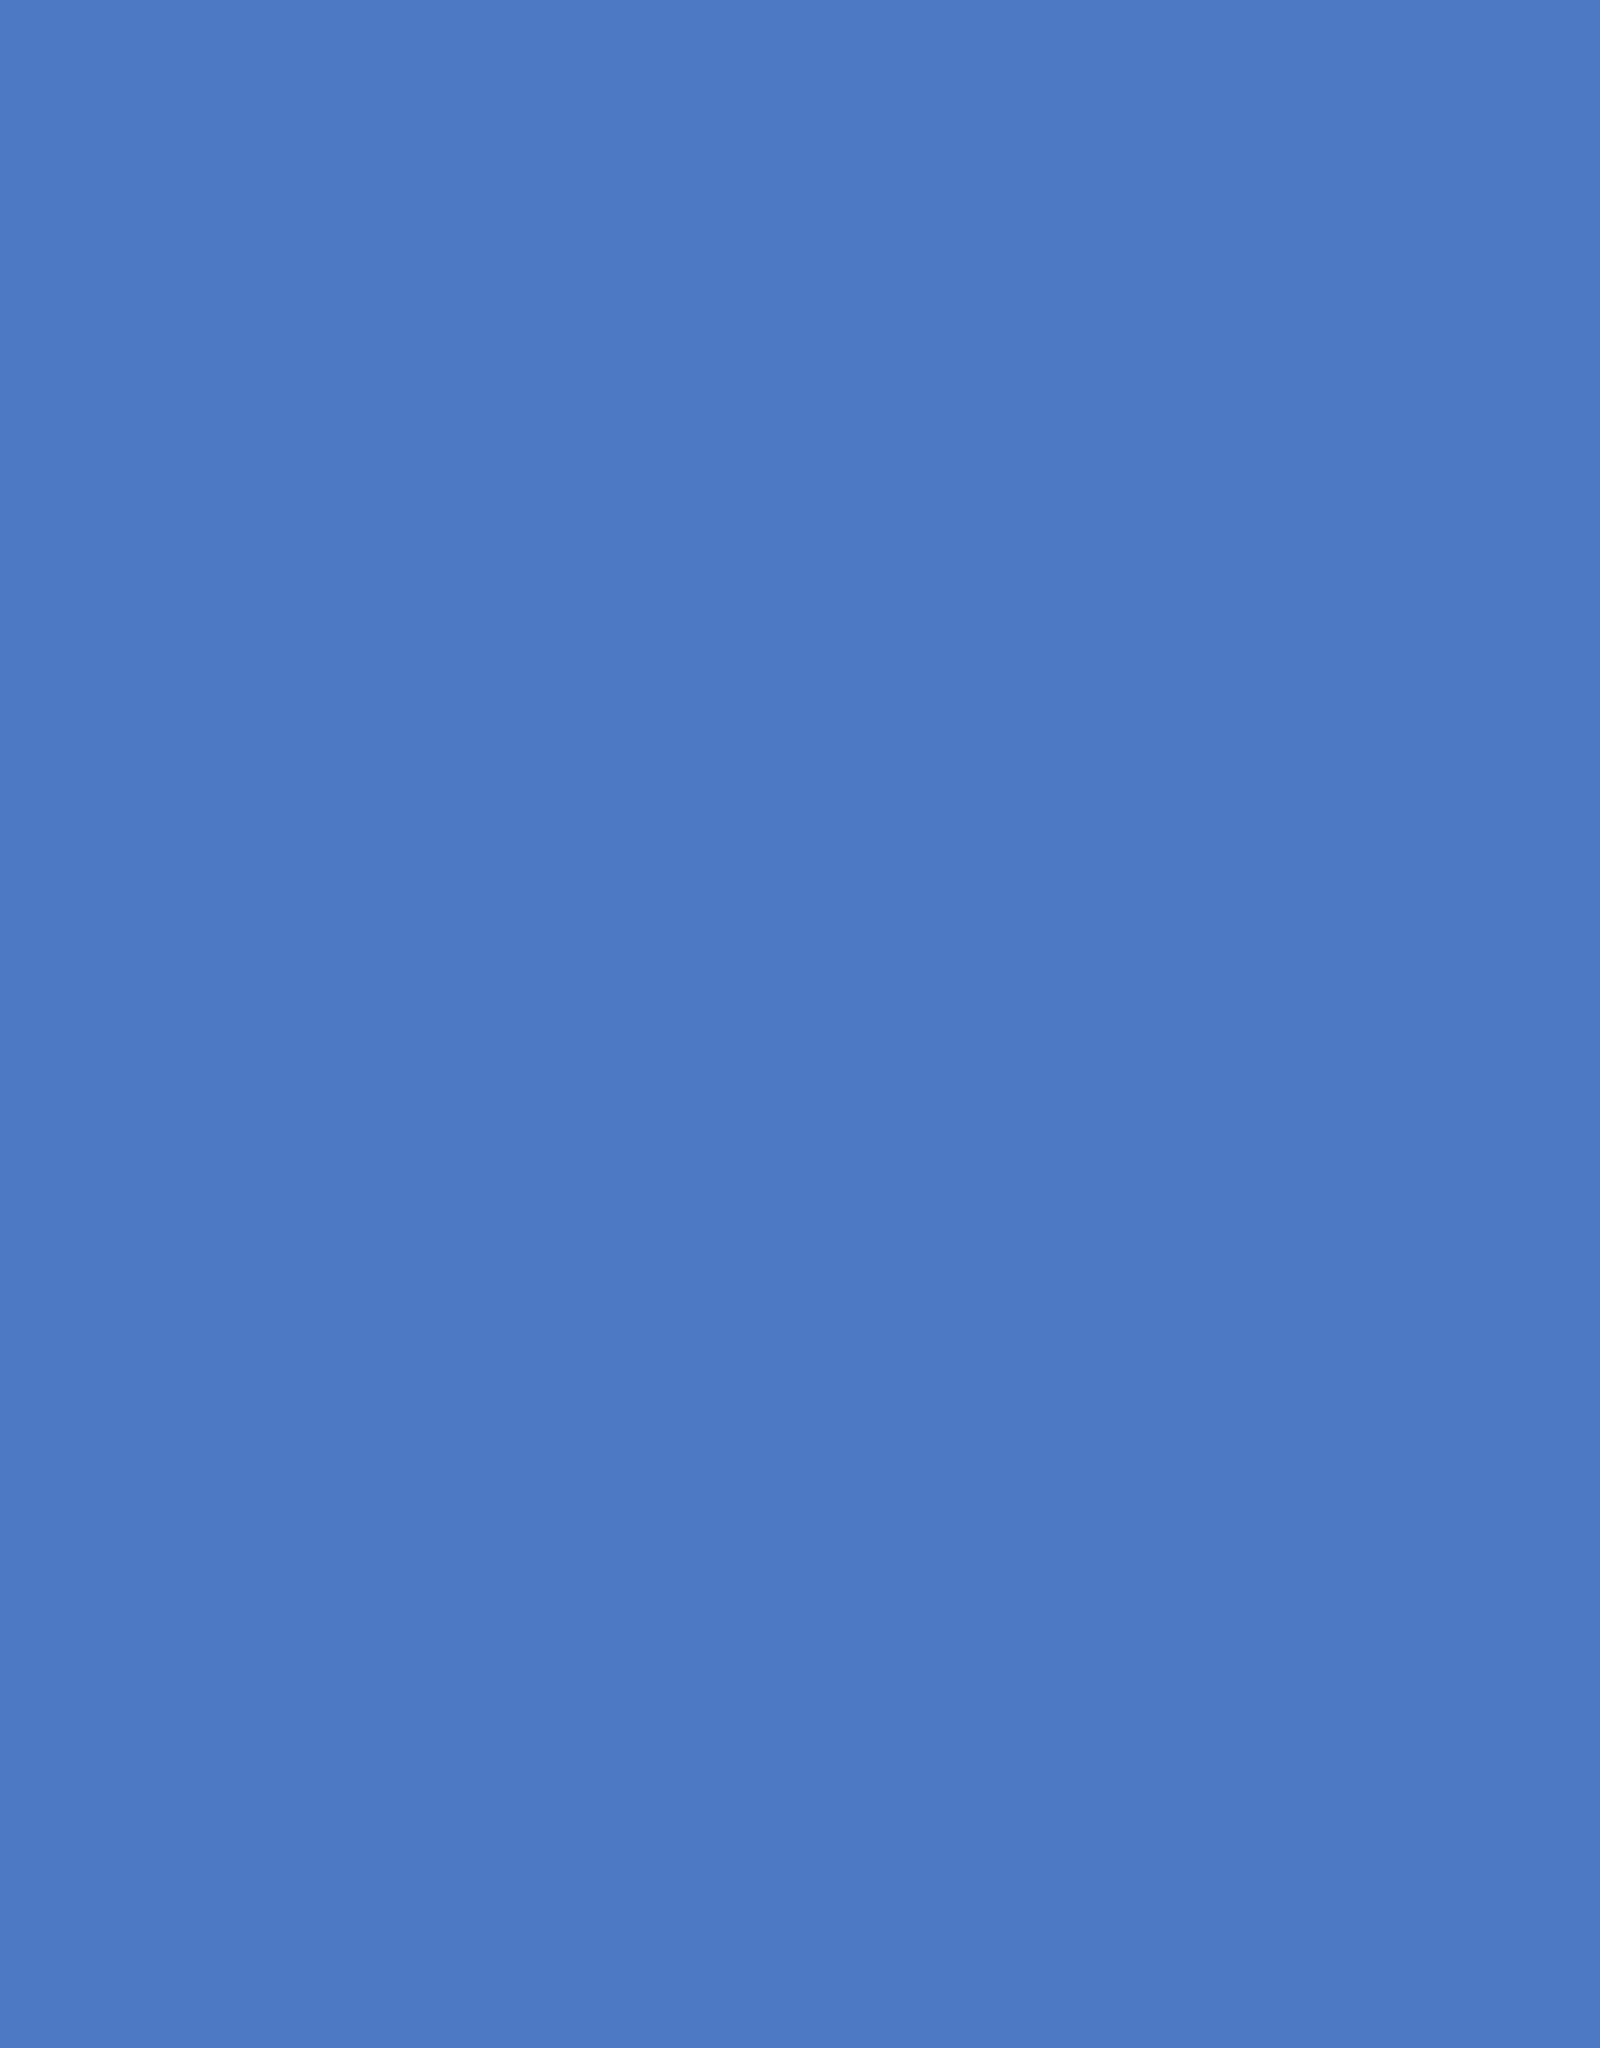 Superior Seamless Superior Seamless 9' Royal Blue #11 (Chroma Key compatible)